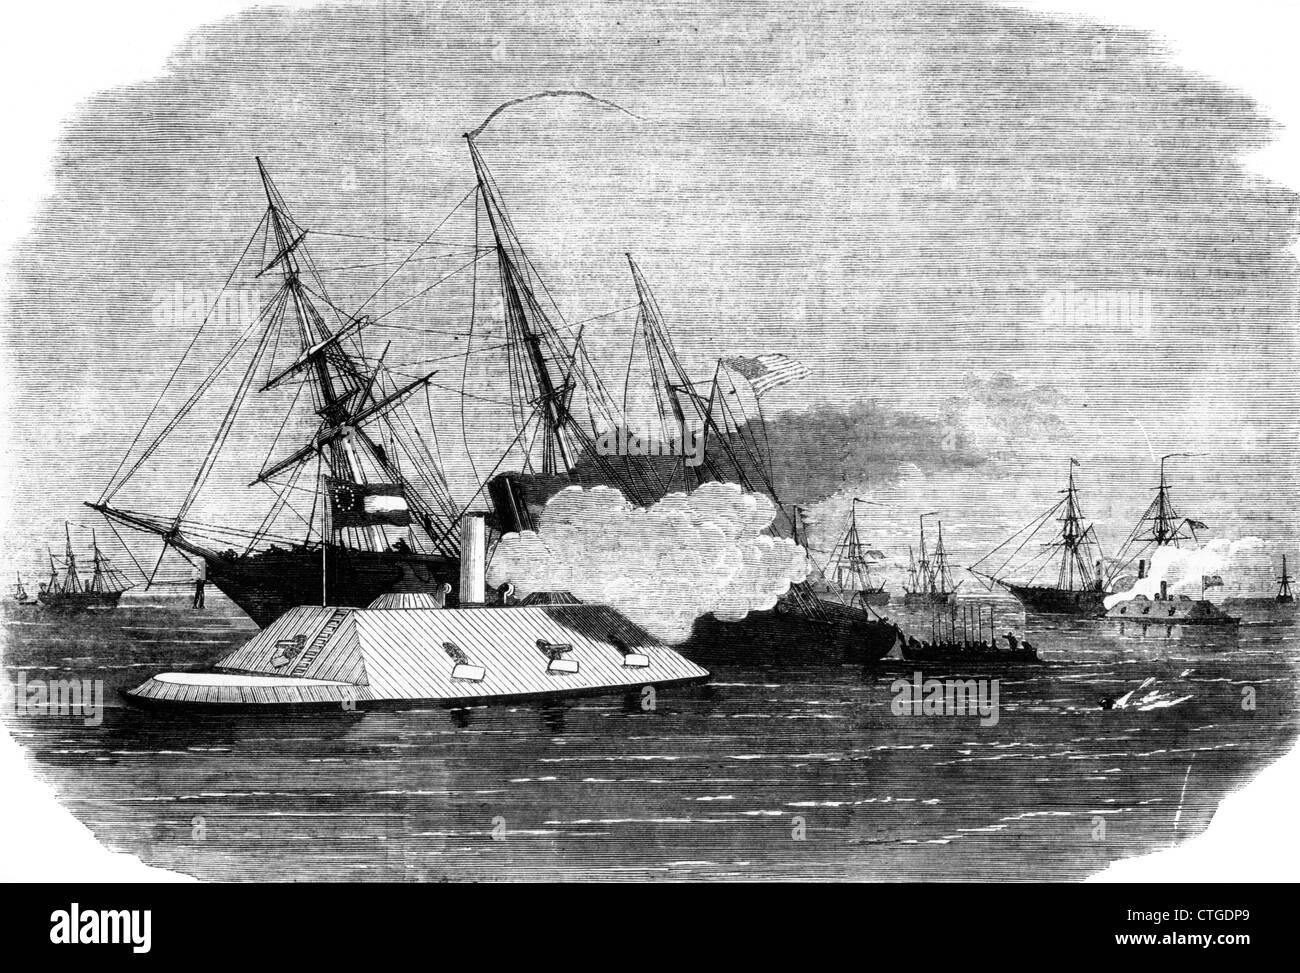 1800s 1860s CONFEDERATE IRONCLAD GUNBOAT ATTACK ON UNION BLOCKADE ...